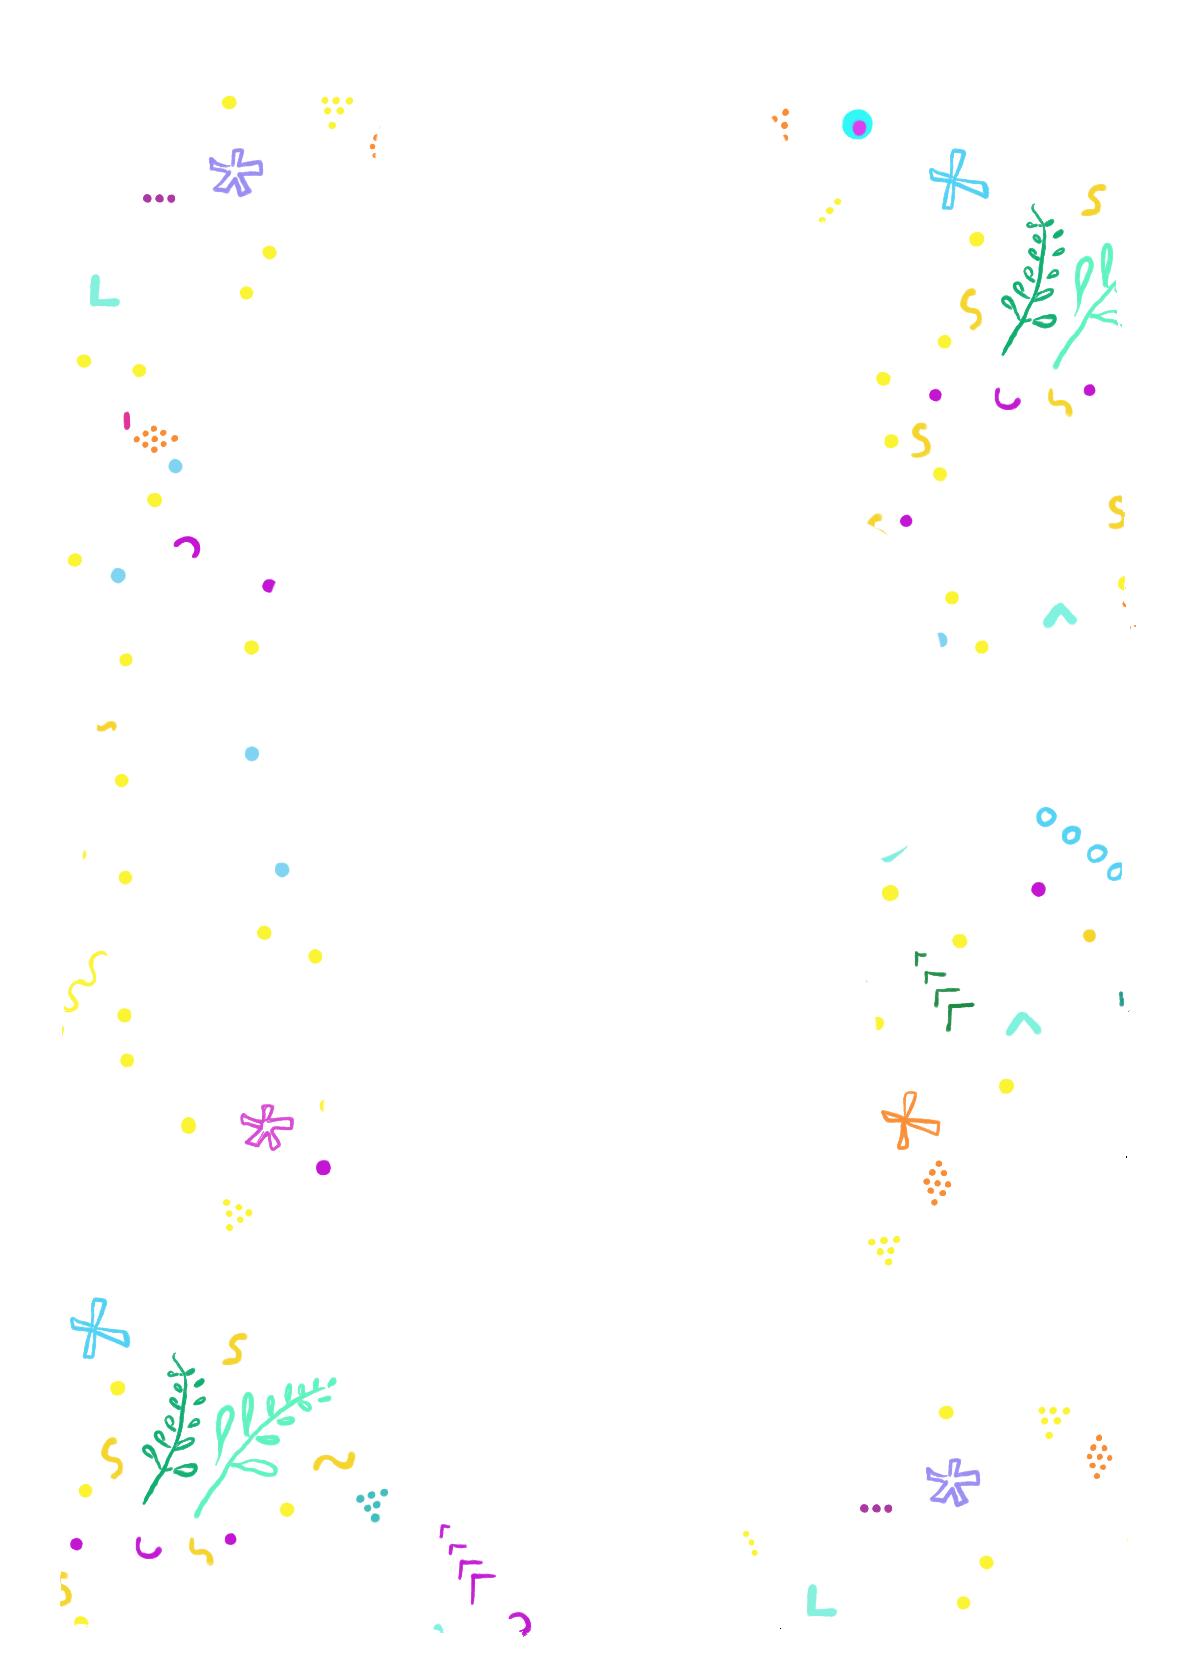 Album 1 - Awit - Bahay KuboSitsiritsit AlibangbangLeron Leron SintaParu-Parong BukidMagtanim ay di biroPakitong-kitongSarung BanggiAti Cu Pung SingsingNanay, TatayBawa't Isa Sa Atin